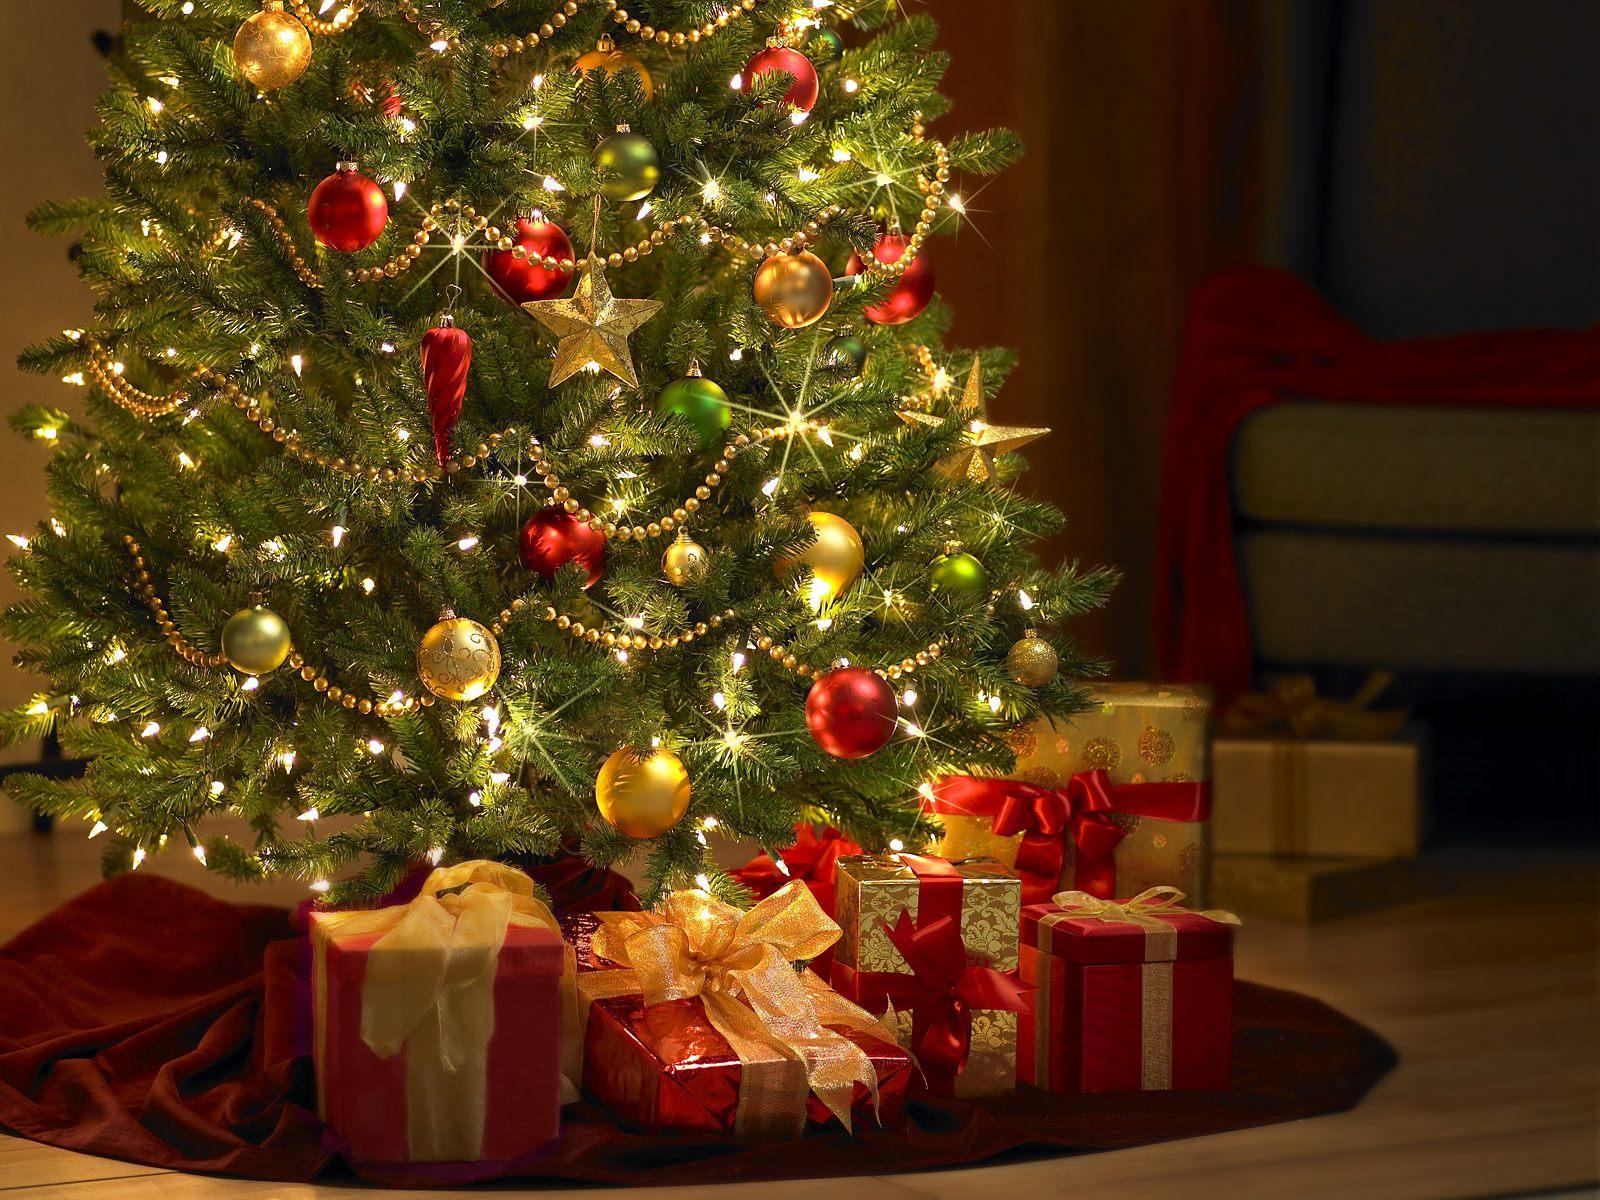 christmasTree1.jpg